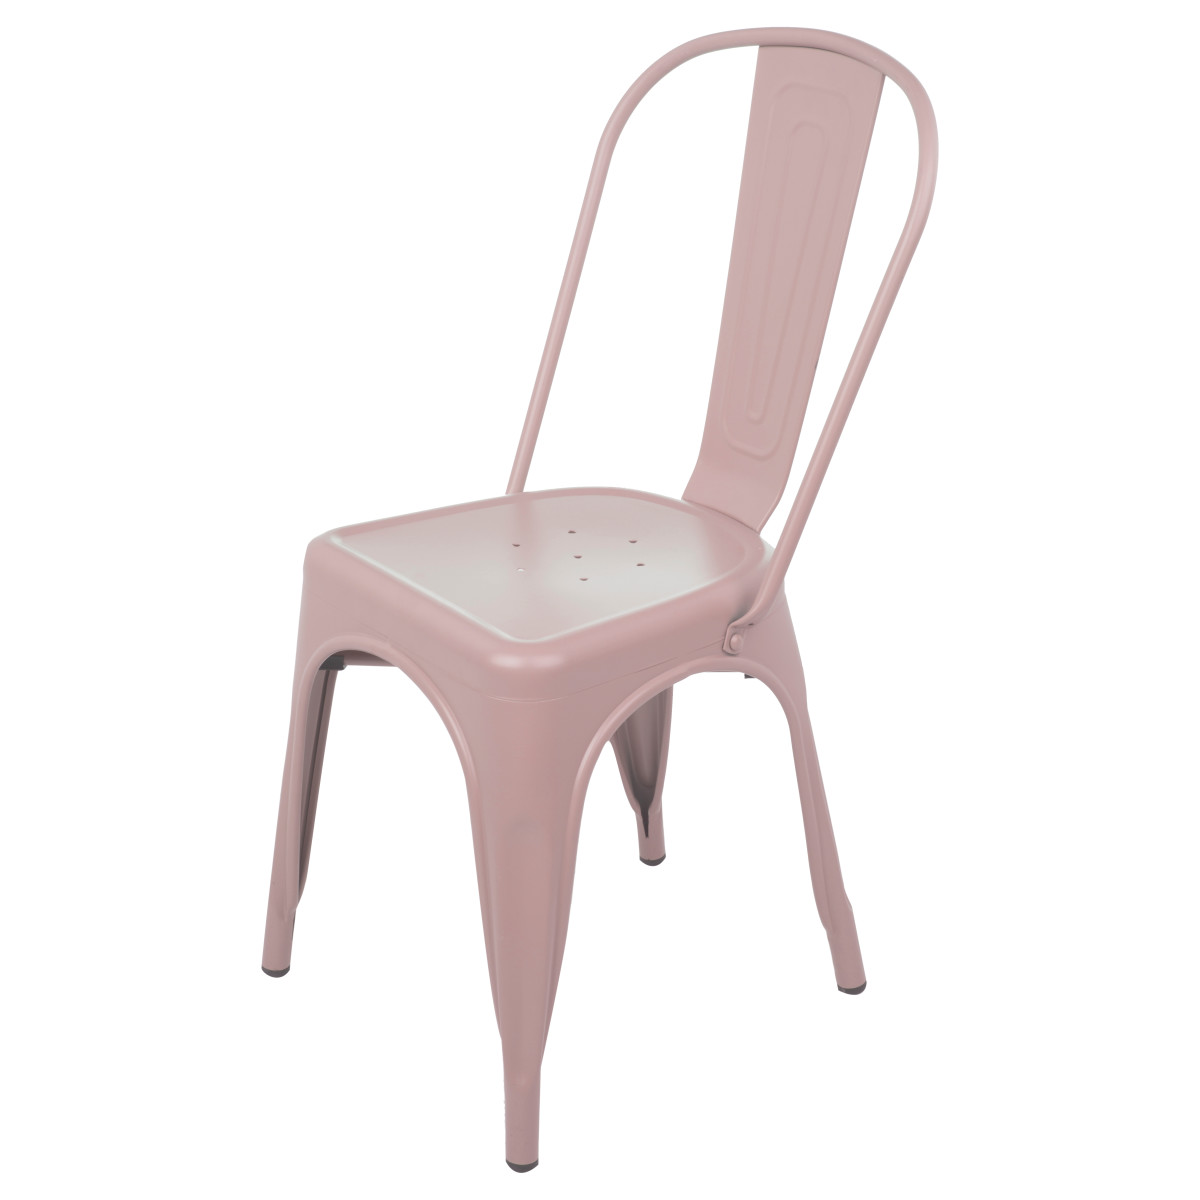 Стул садовый Soho 440x840x534 мм металл цвет розовый